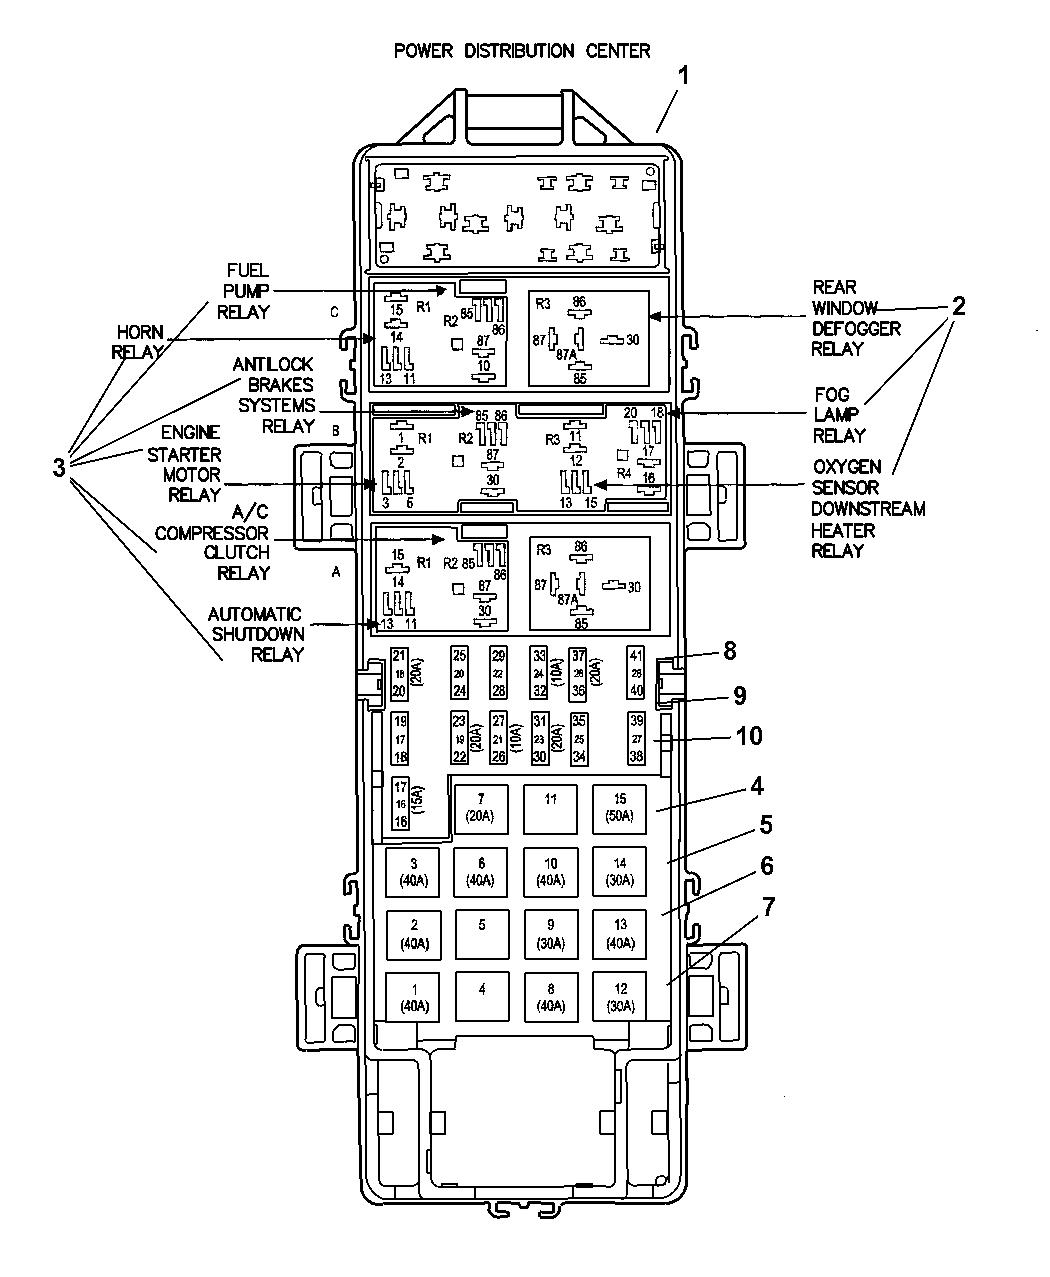 2000 Jeep Wrangler Power Distribution Center Relay Fuses